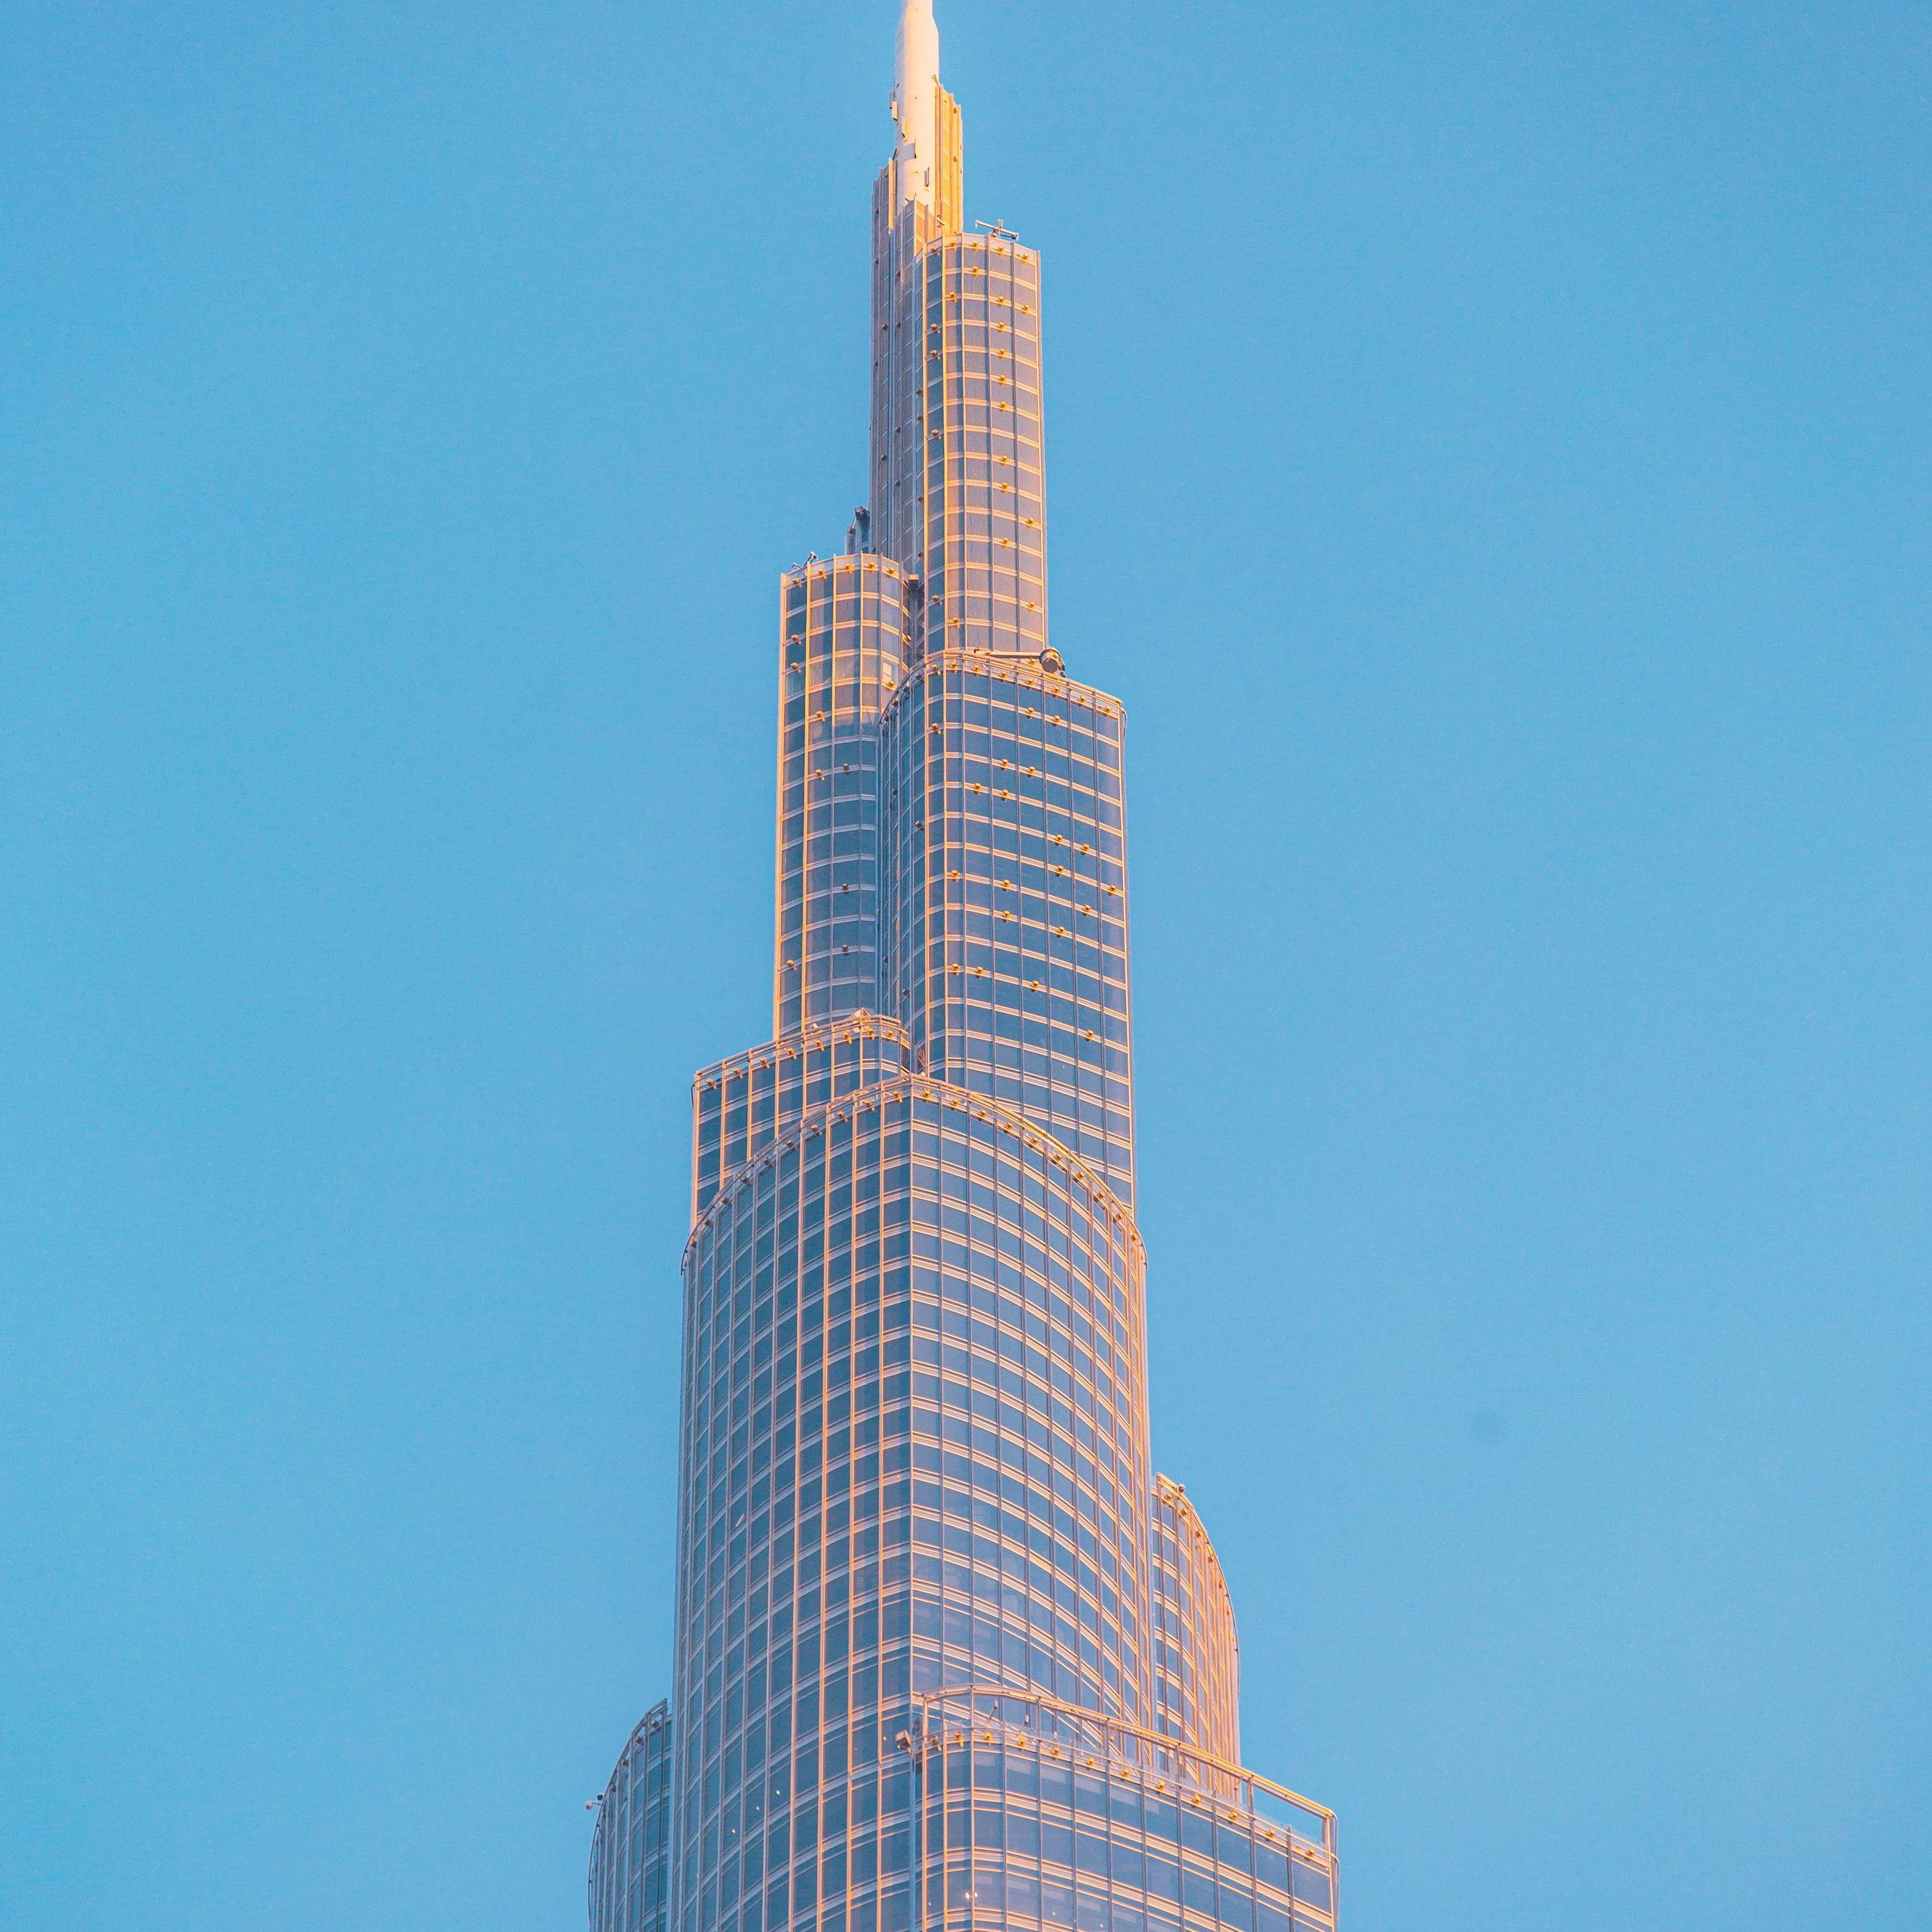 2780x2780 Wallpaper tower, skyscraper, building, architecture, sky, minimalism